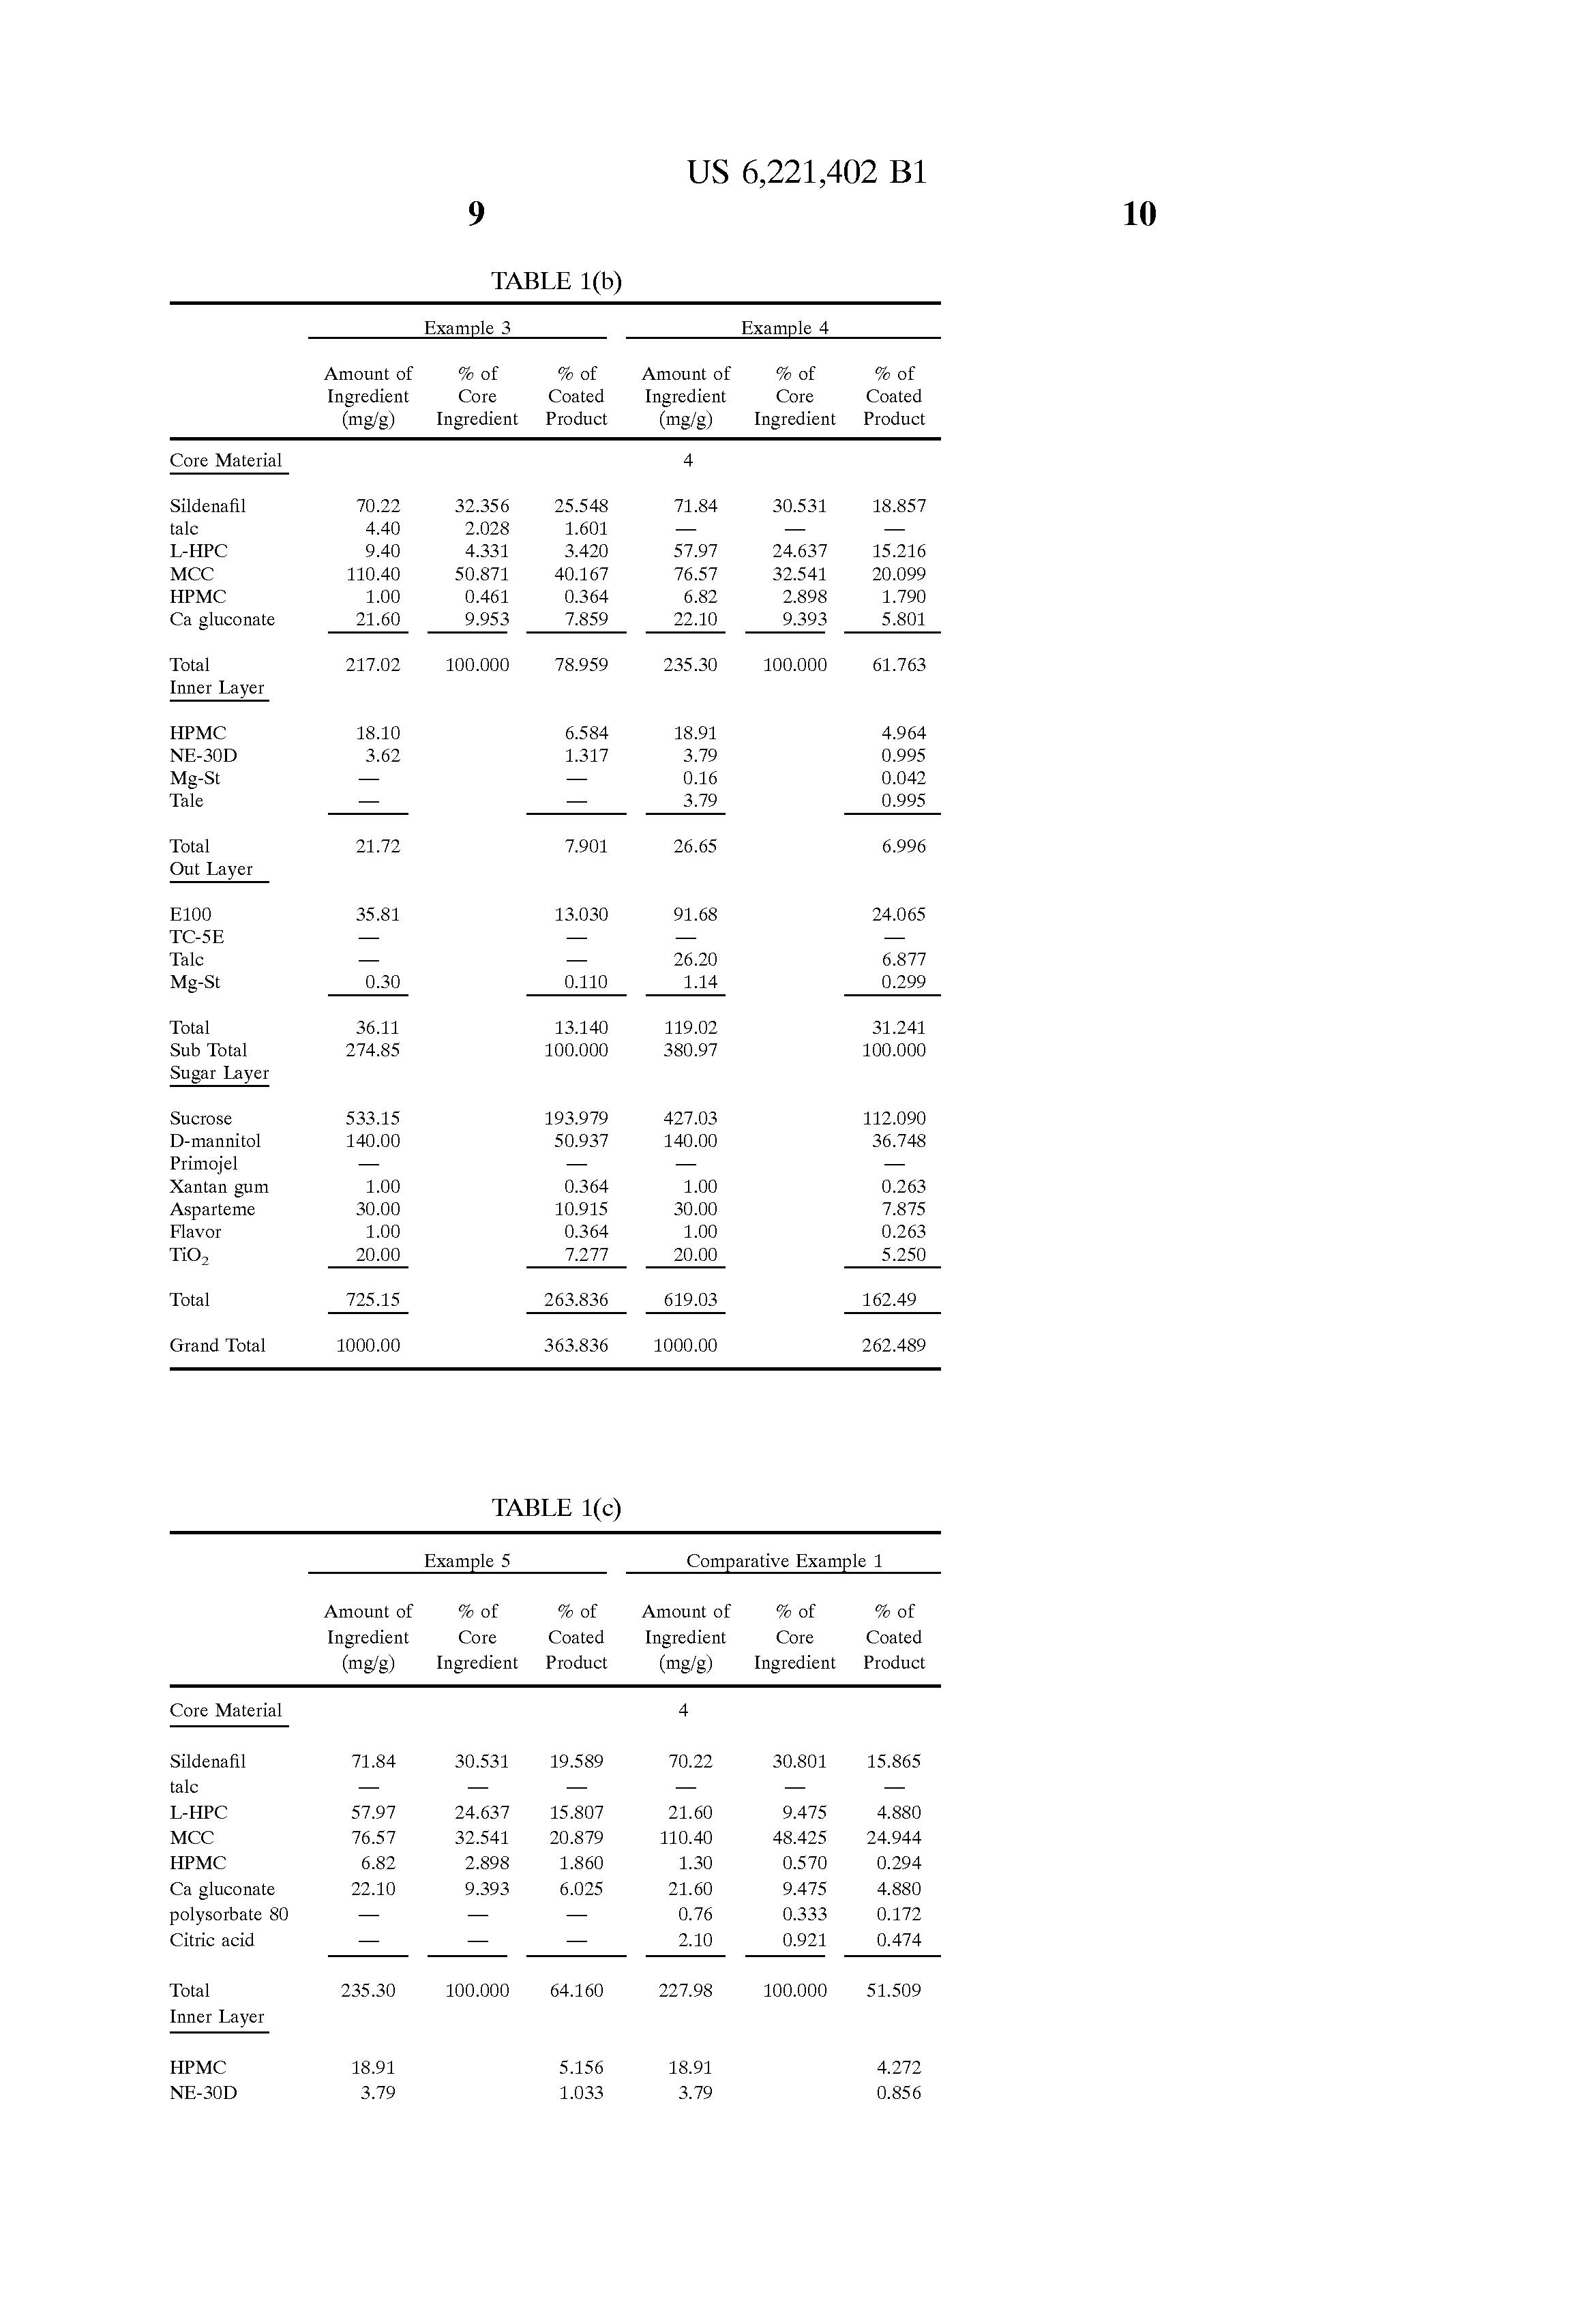 lipitor generic equivalent